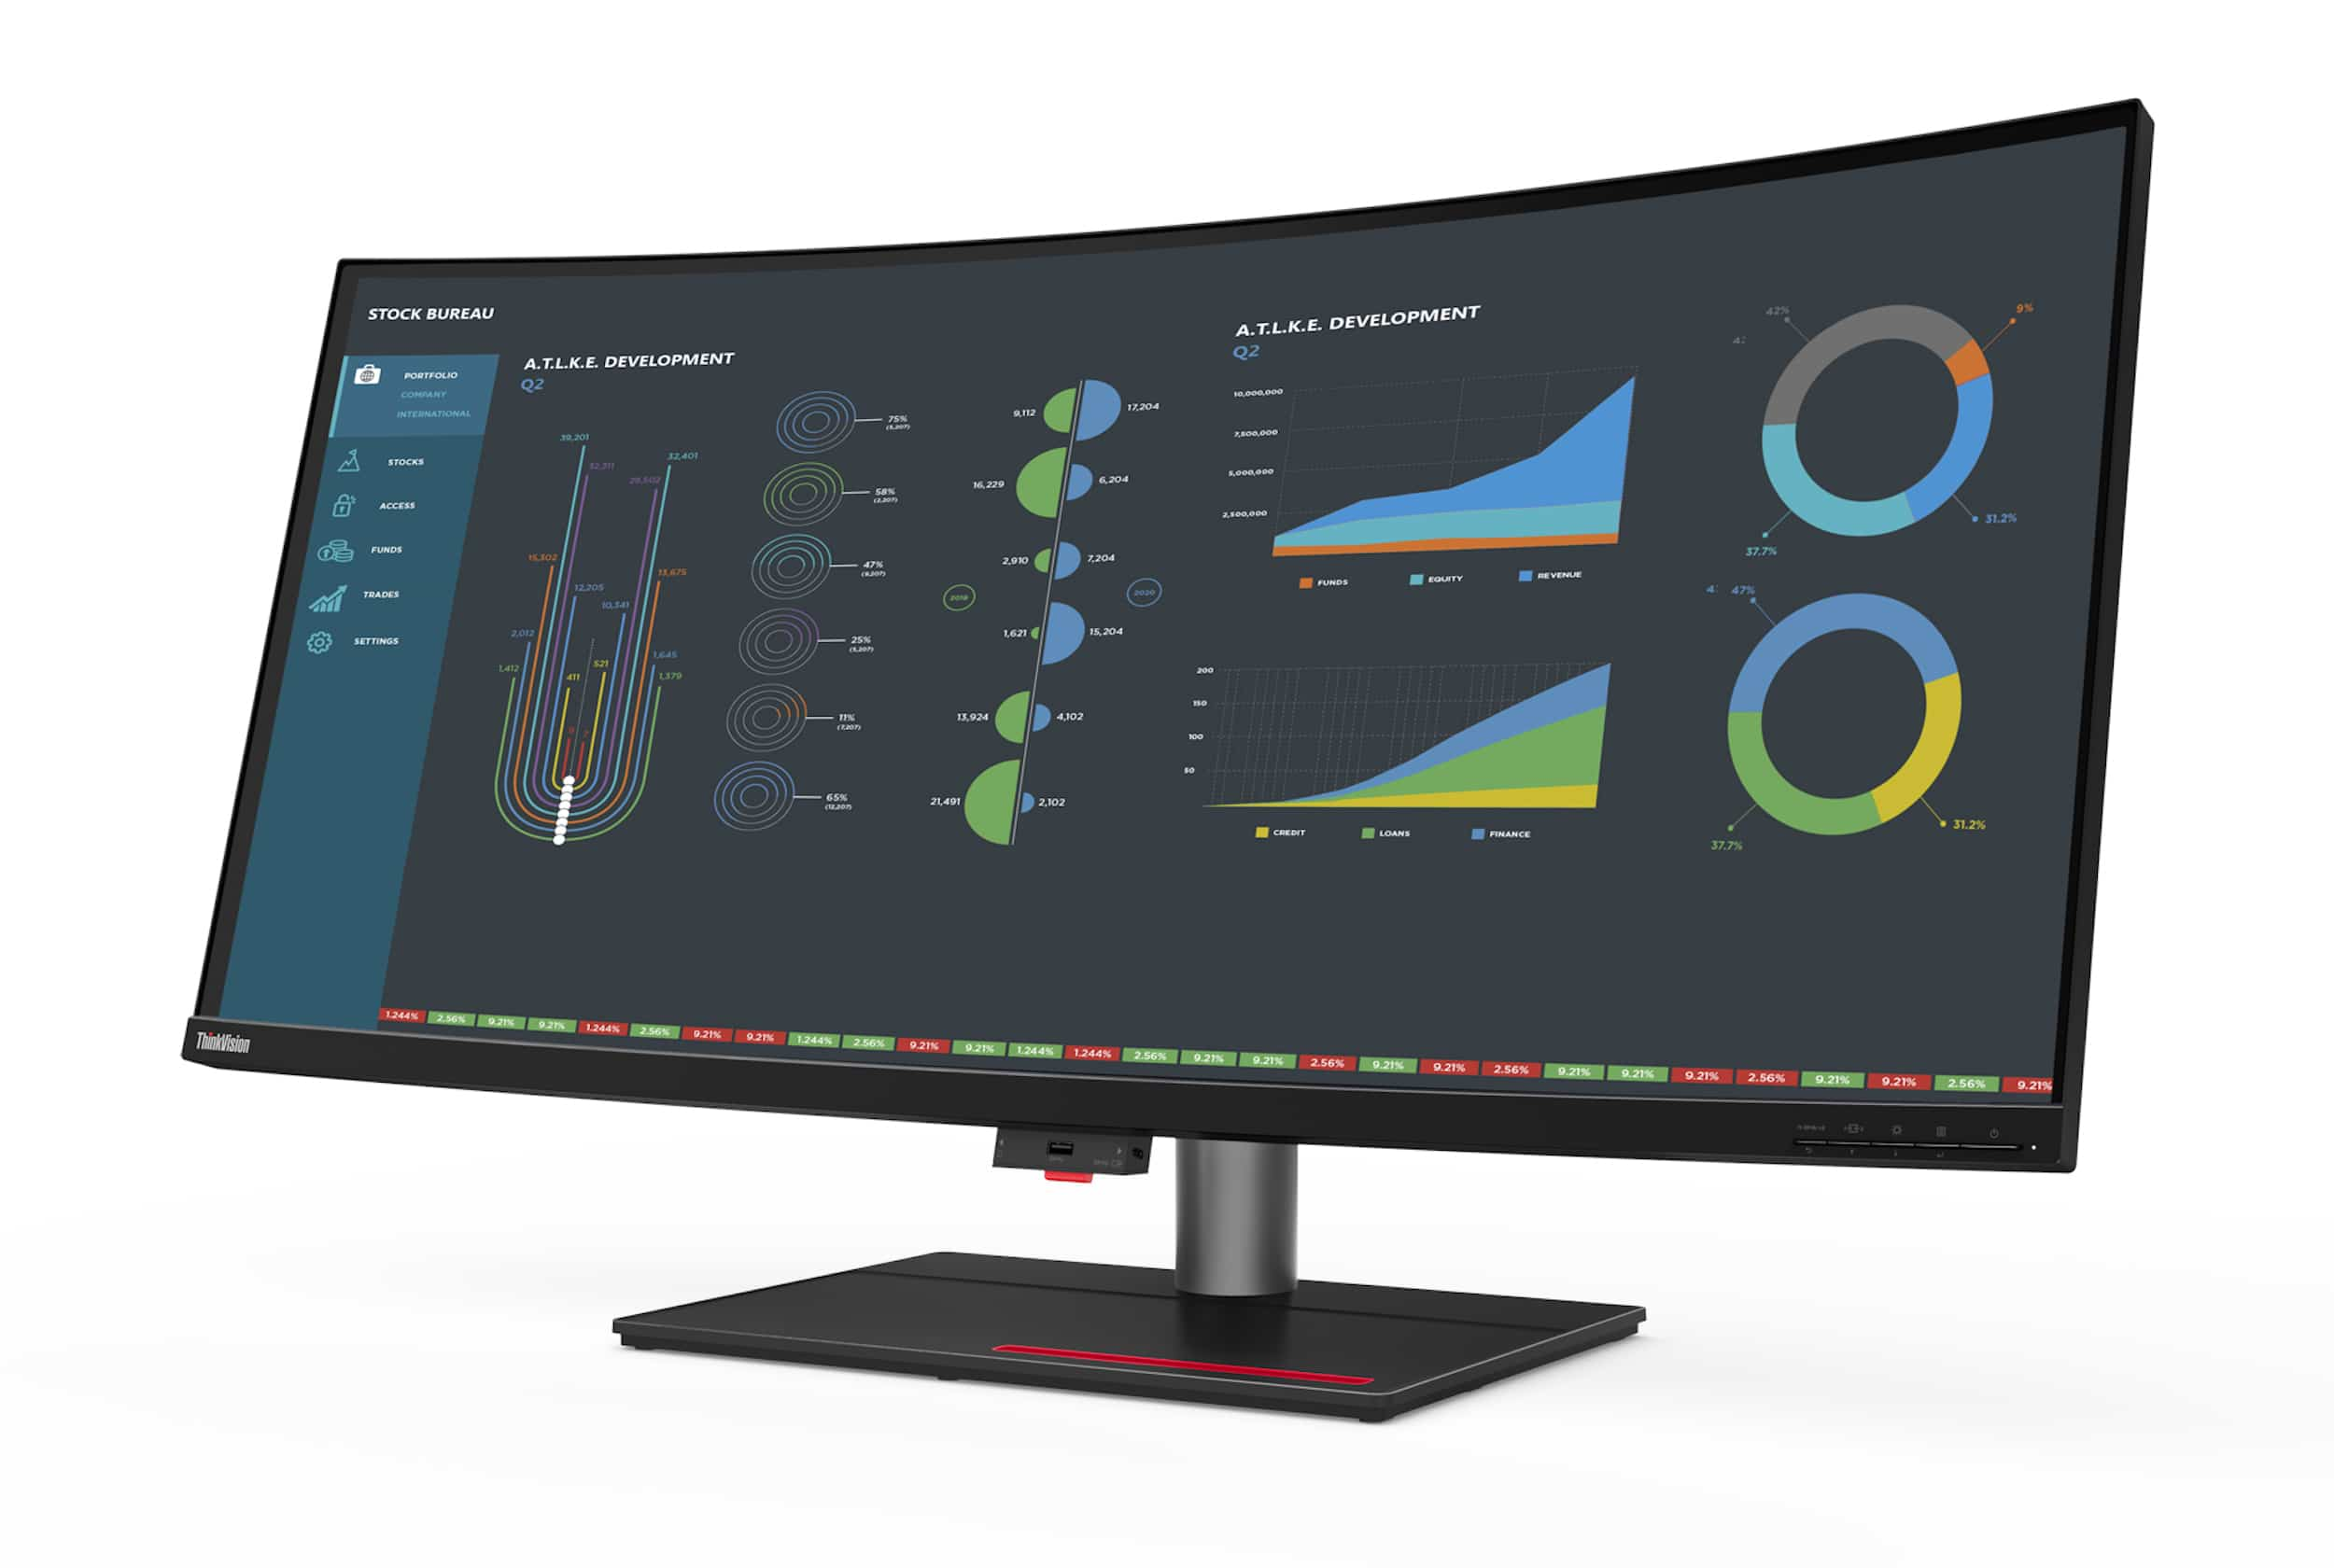 ThinkVision P40w monitor